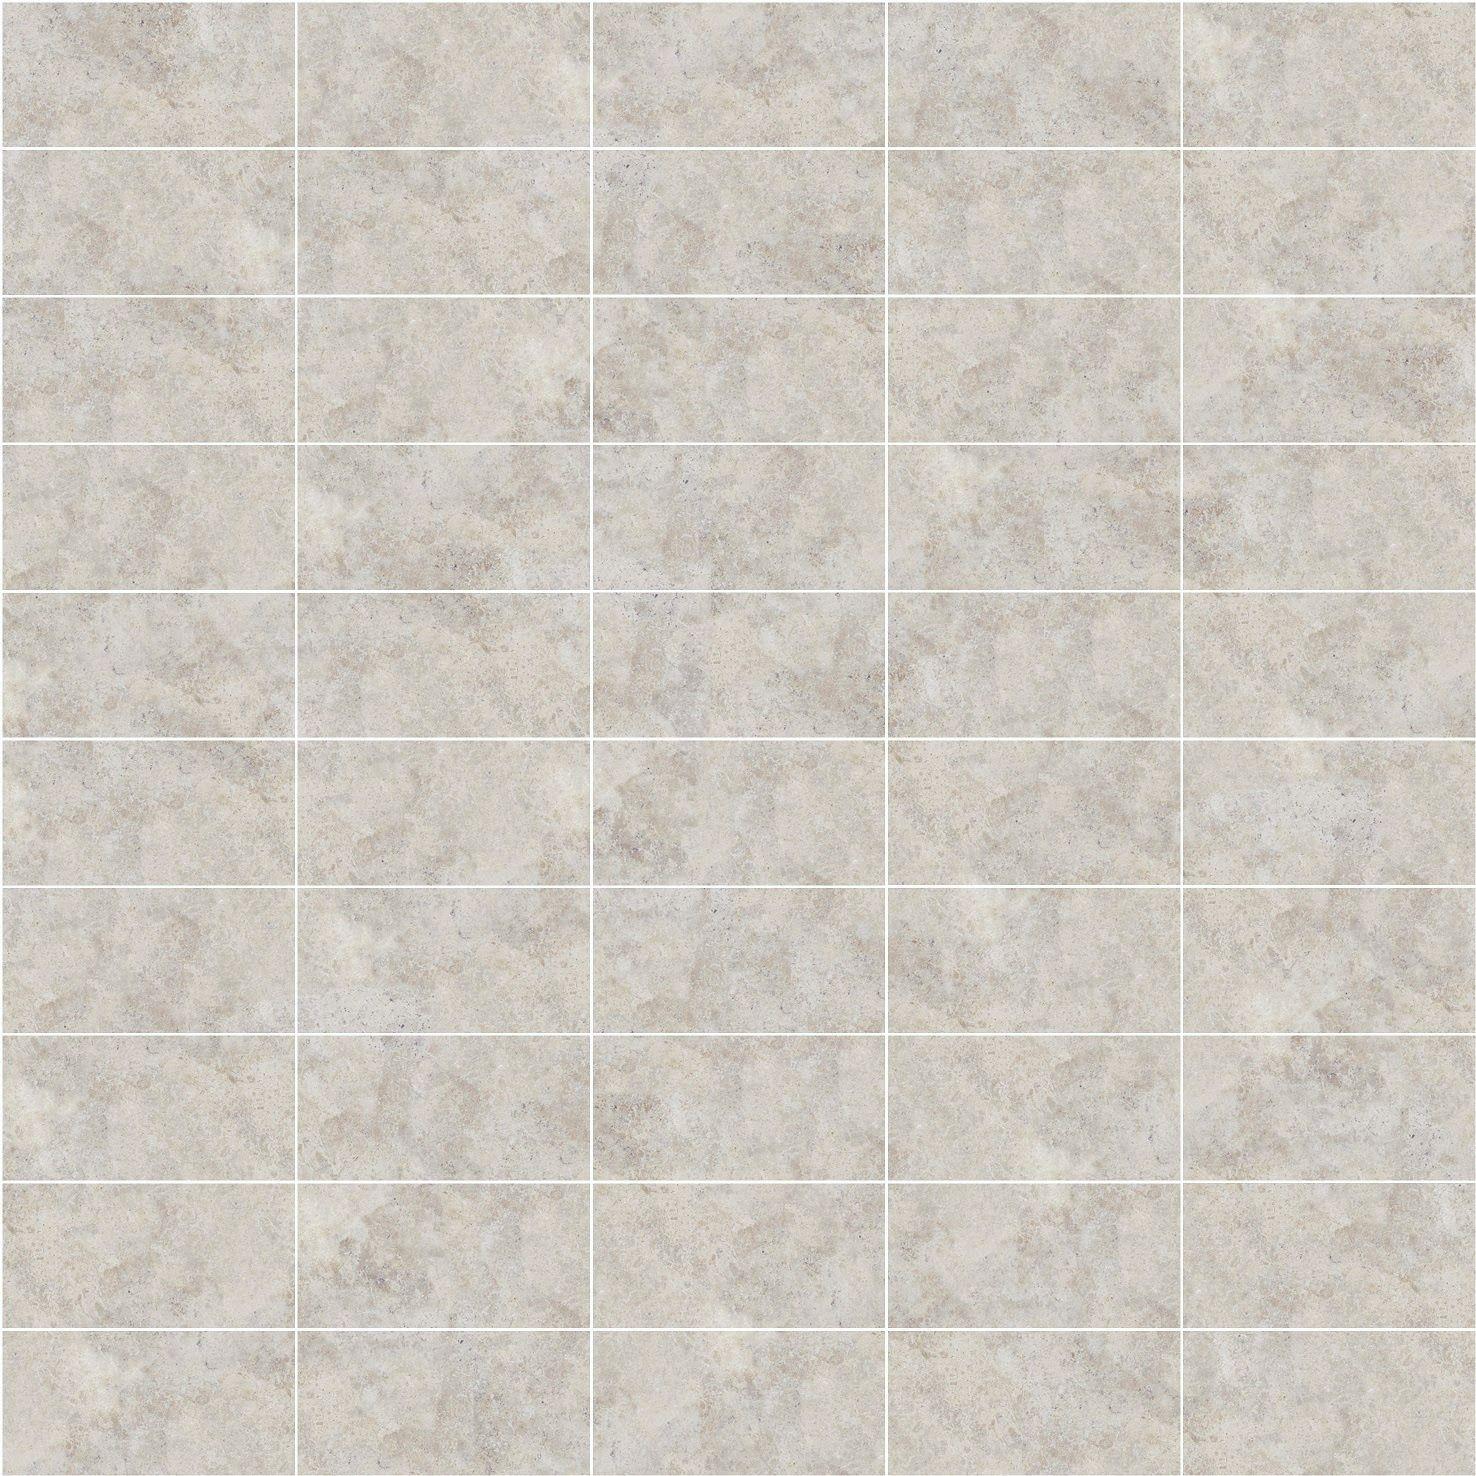 Ceramic Tile Texture Seamless Tiles Texture Ceramic Texture